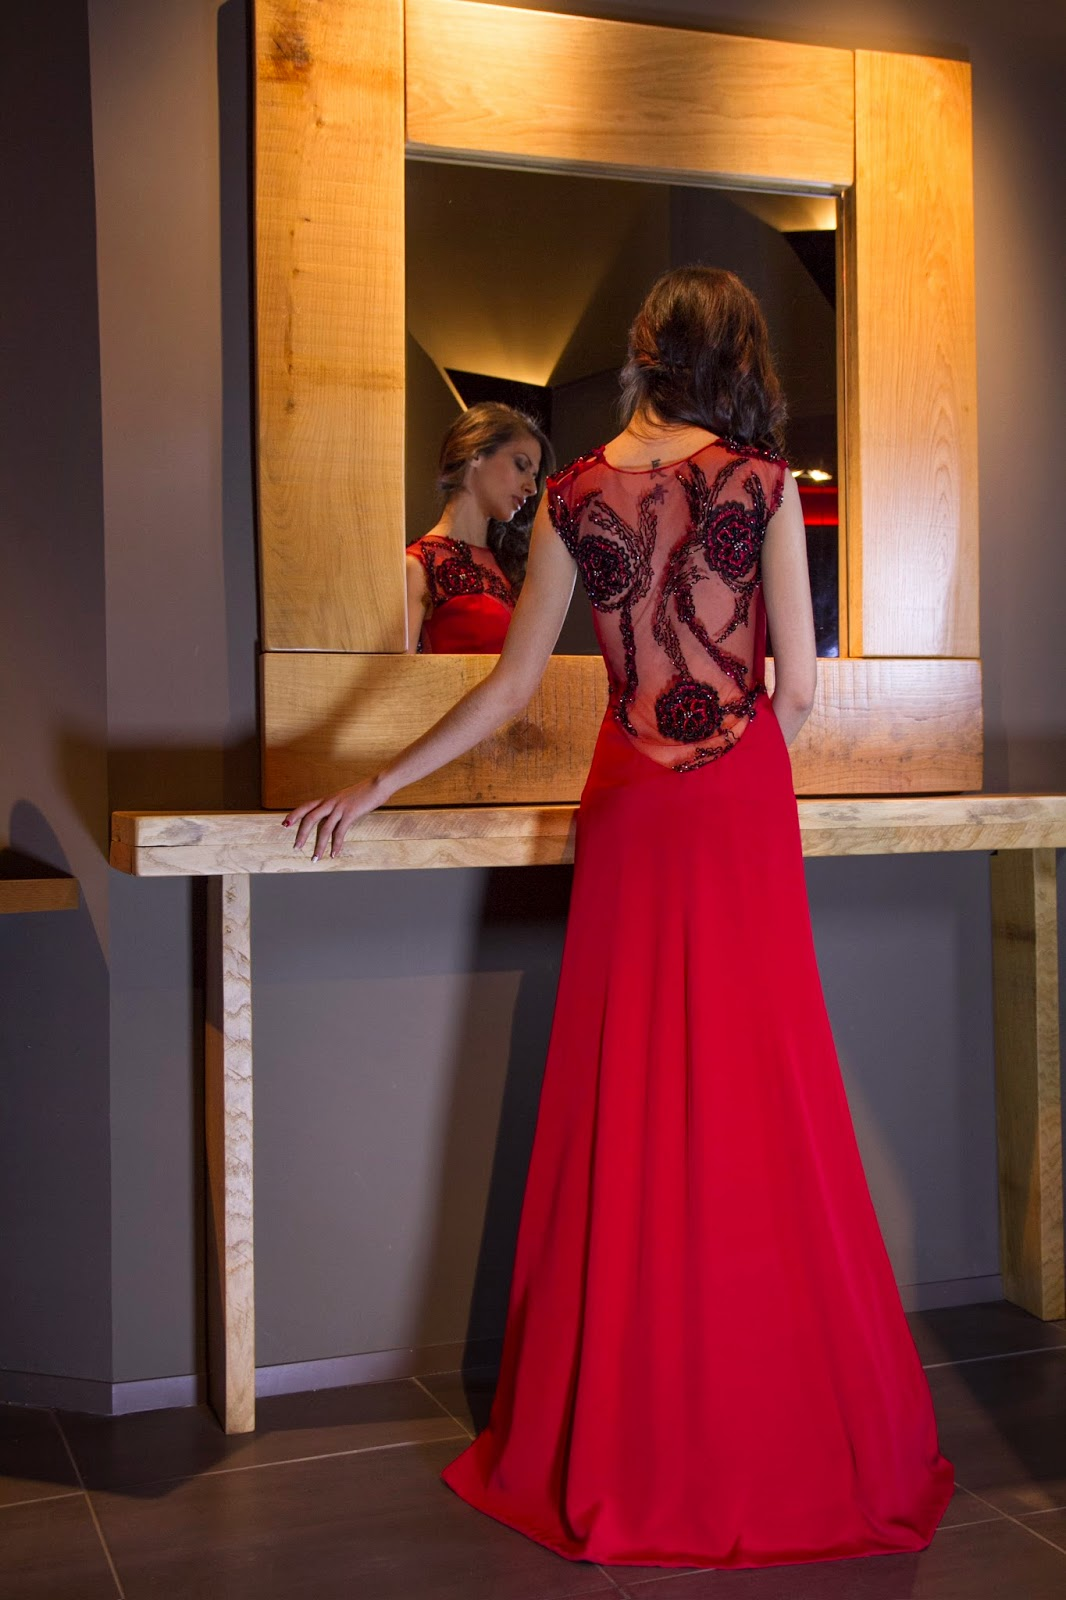 fcb2068c70ae Βραδυνά φορέματα από το atelier Alkmini. alkmini atelier. Μοναδικά Νυφικά    Φορέματα. Χρυσοστόμου Σμύρνης 6 Θεσσαλονίκη